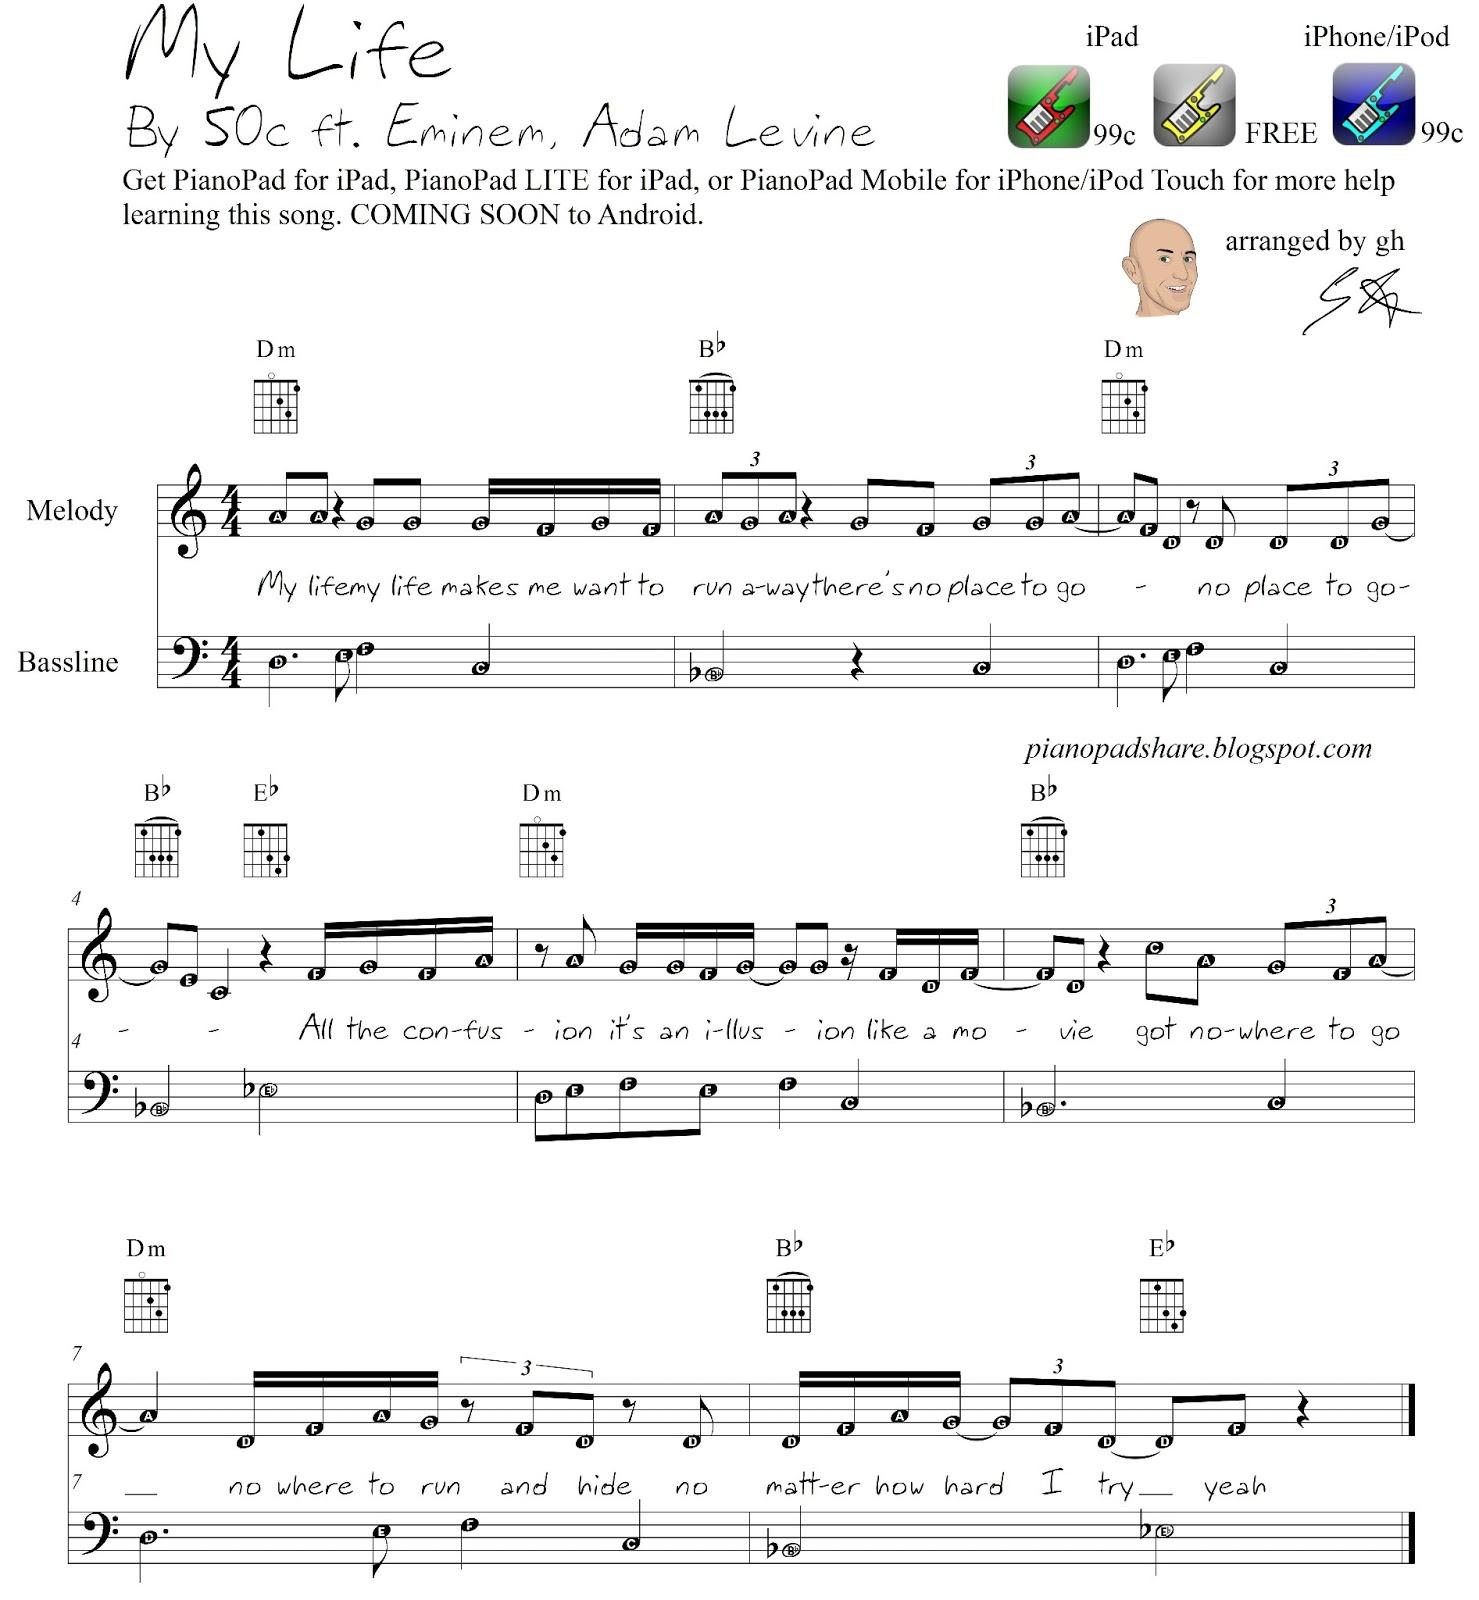 http://1.bp.blogspot.com/-jDESoEmySUk/URofxMUNiXI/AAAAAAAABiU/SdSedUZi44o/s1600/My+Life+50c+feat+Eminem+Adam+Levine+SHEET+MUSIC+simple+with+letters+for+pianopad+app+users+pianopadsharedotblogspot.jpg